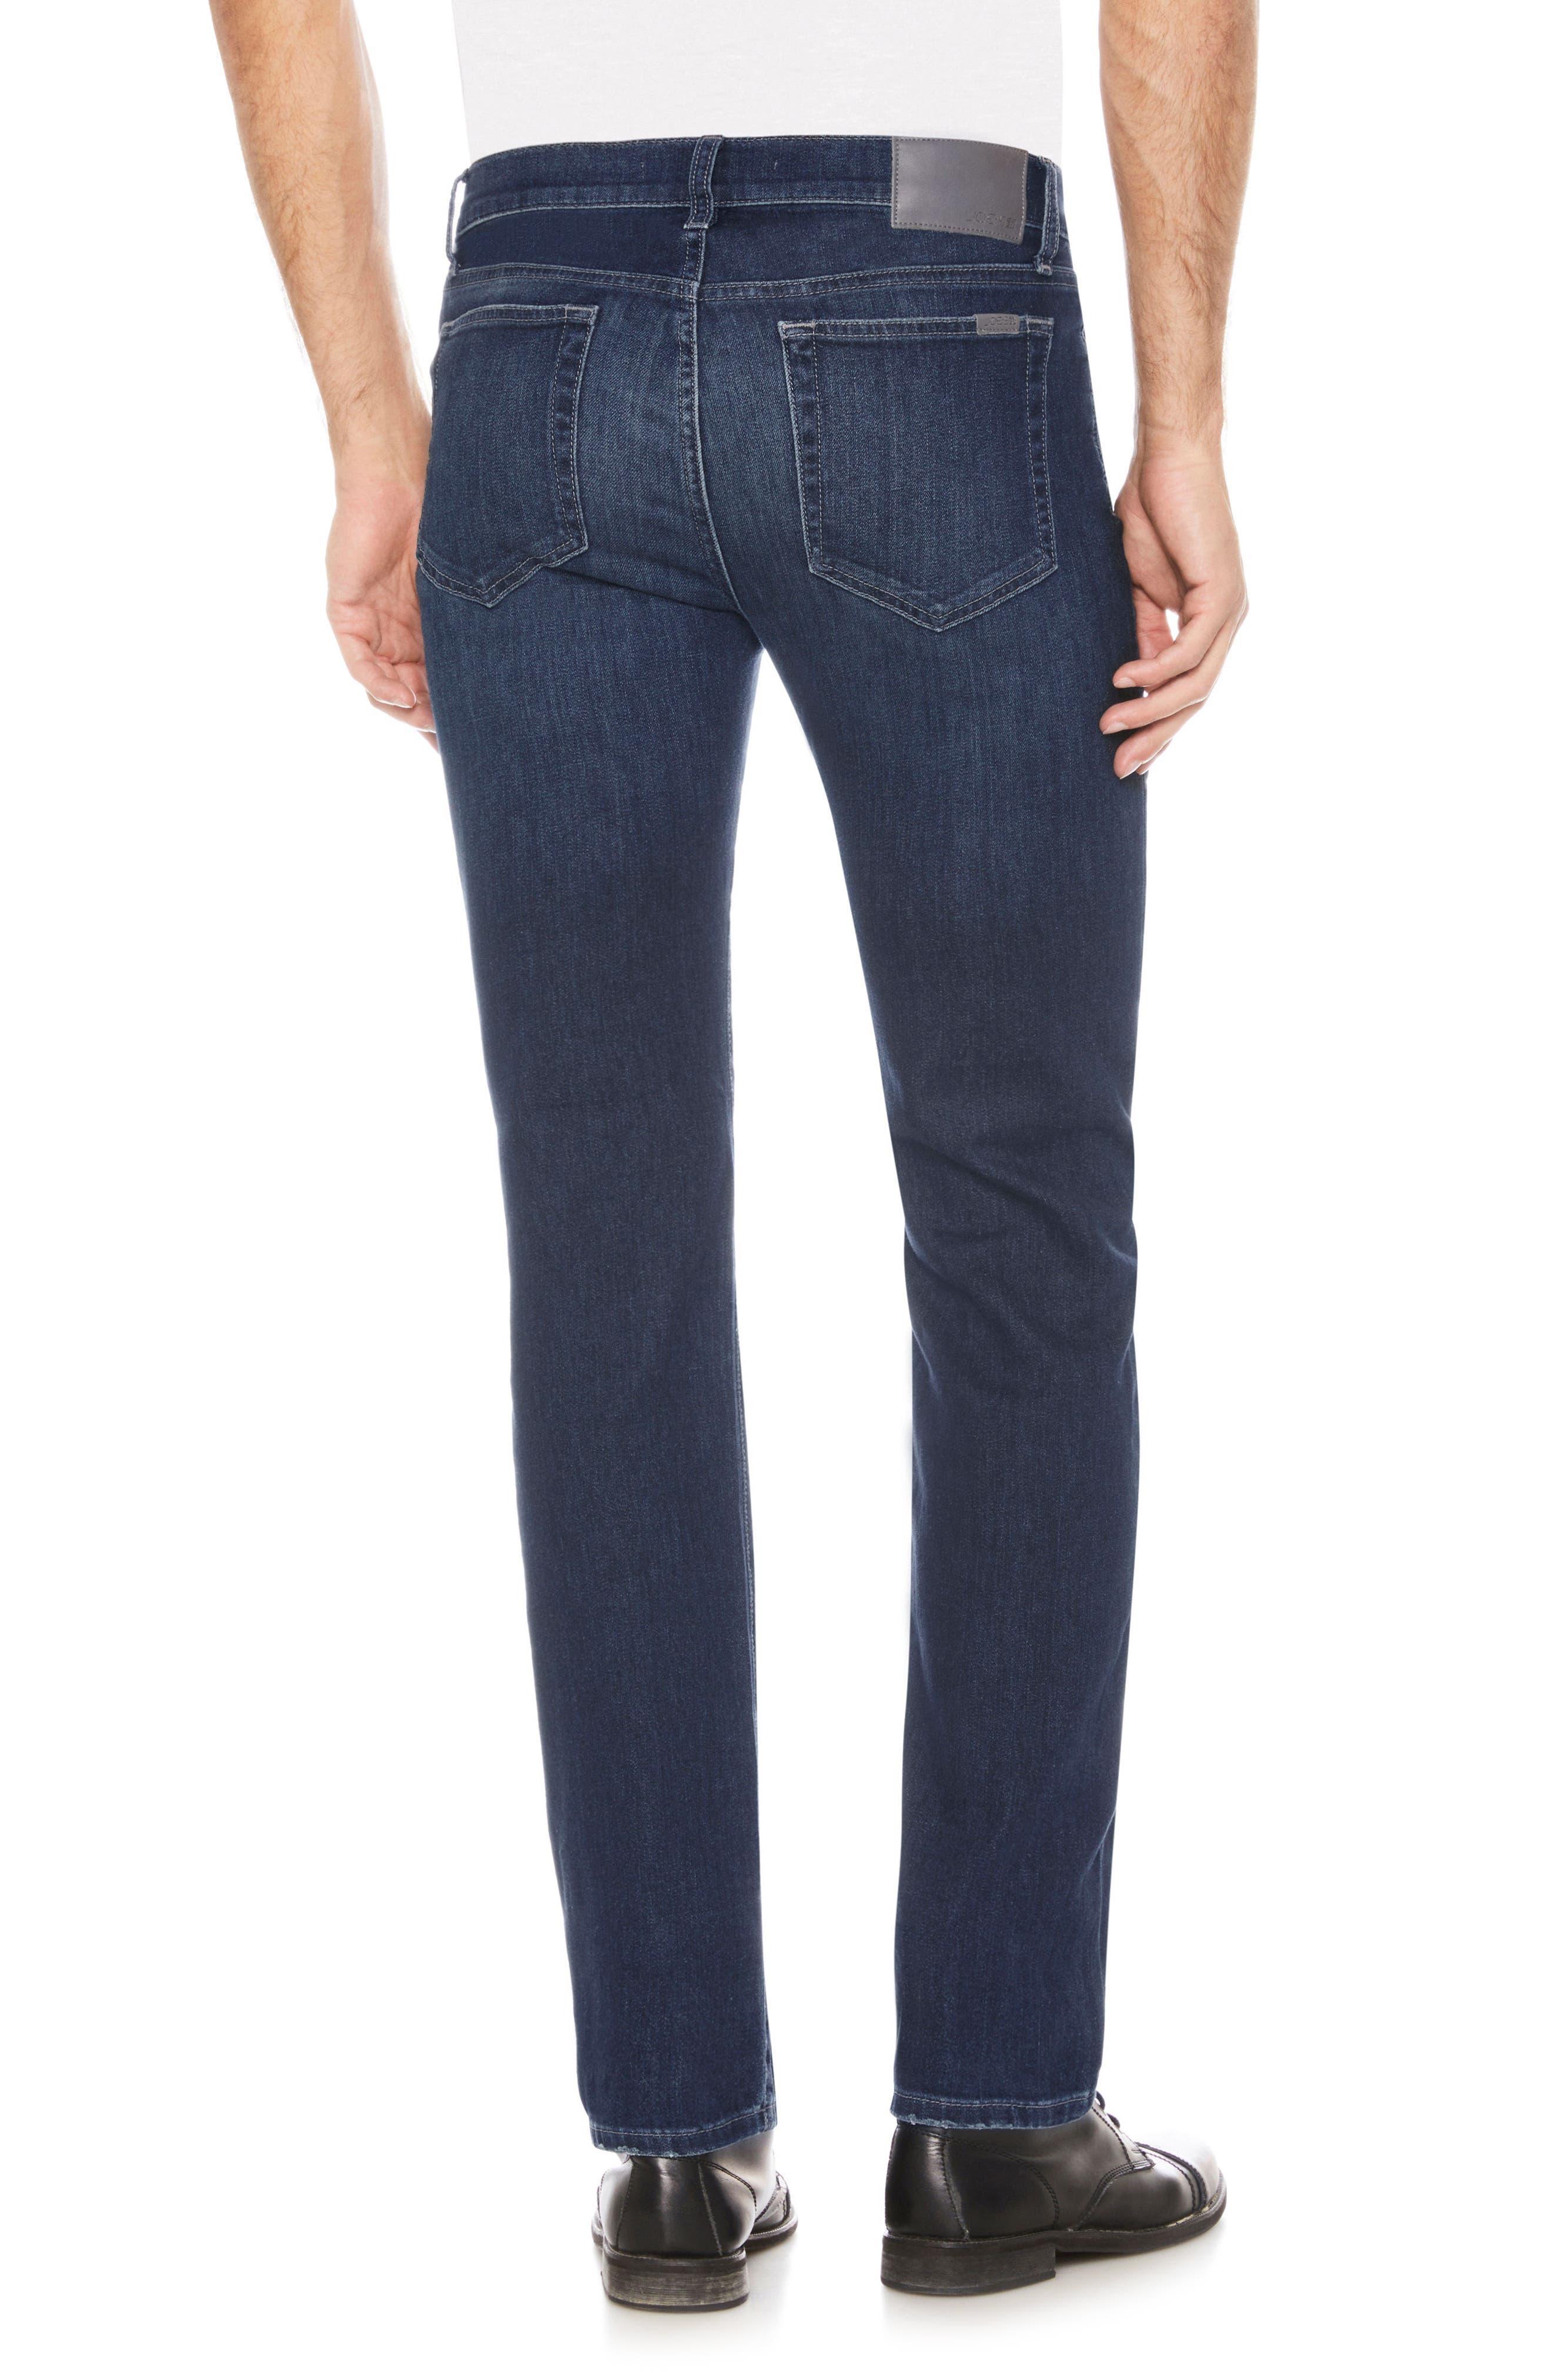 Brixton Slim Straight Leg Jeans,                             Alternate thumbnail 2, color,                             SANDERS